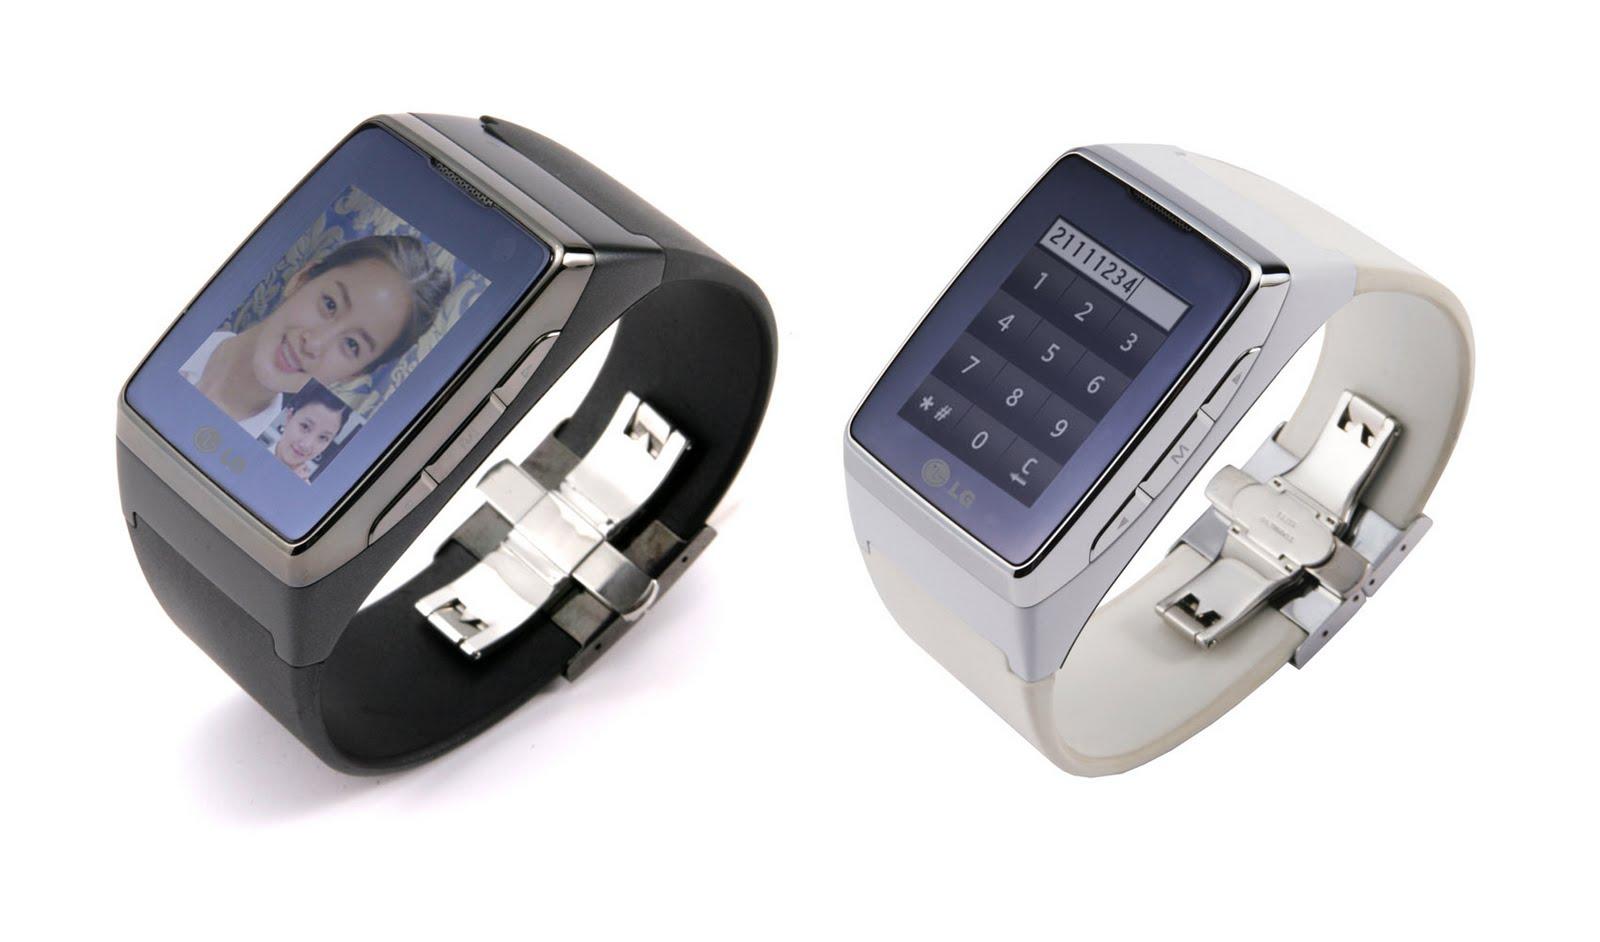 Watches: Wrist watch phone LG GD910.